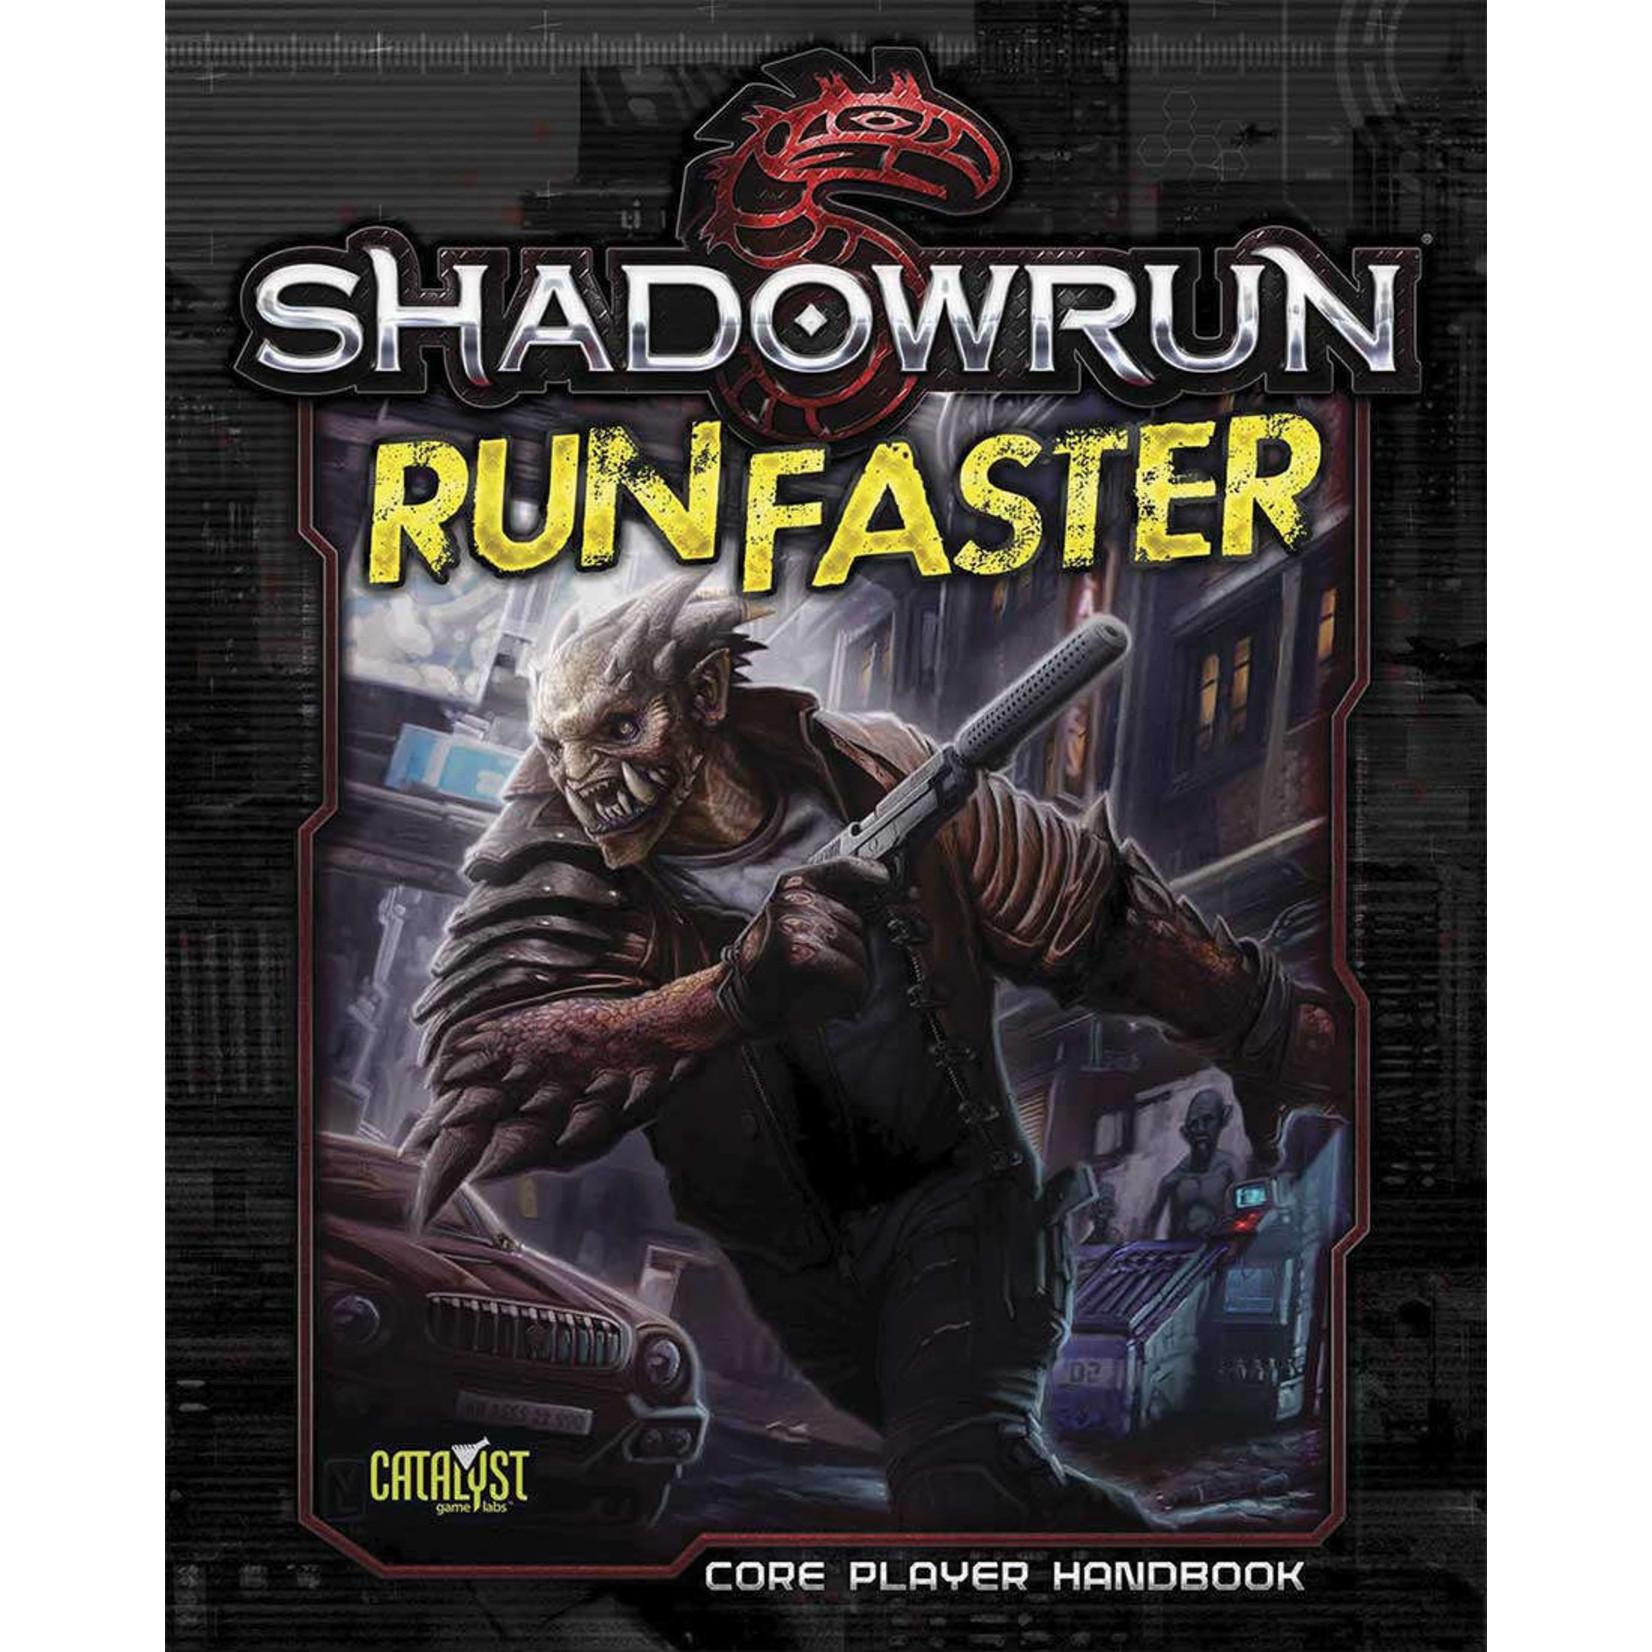 Shadowrun RPG Run Faster